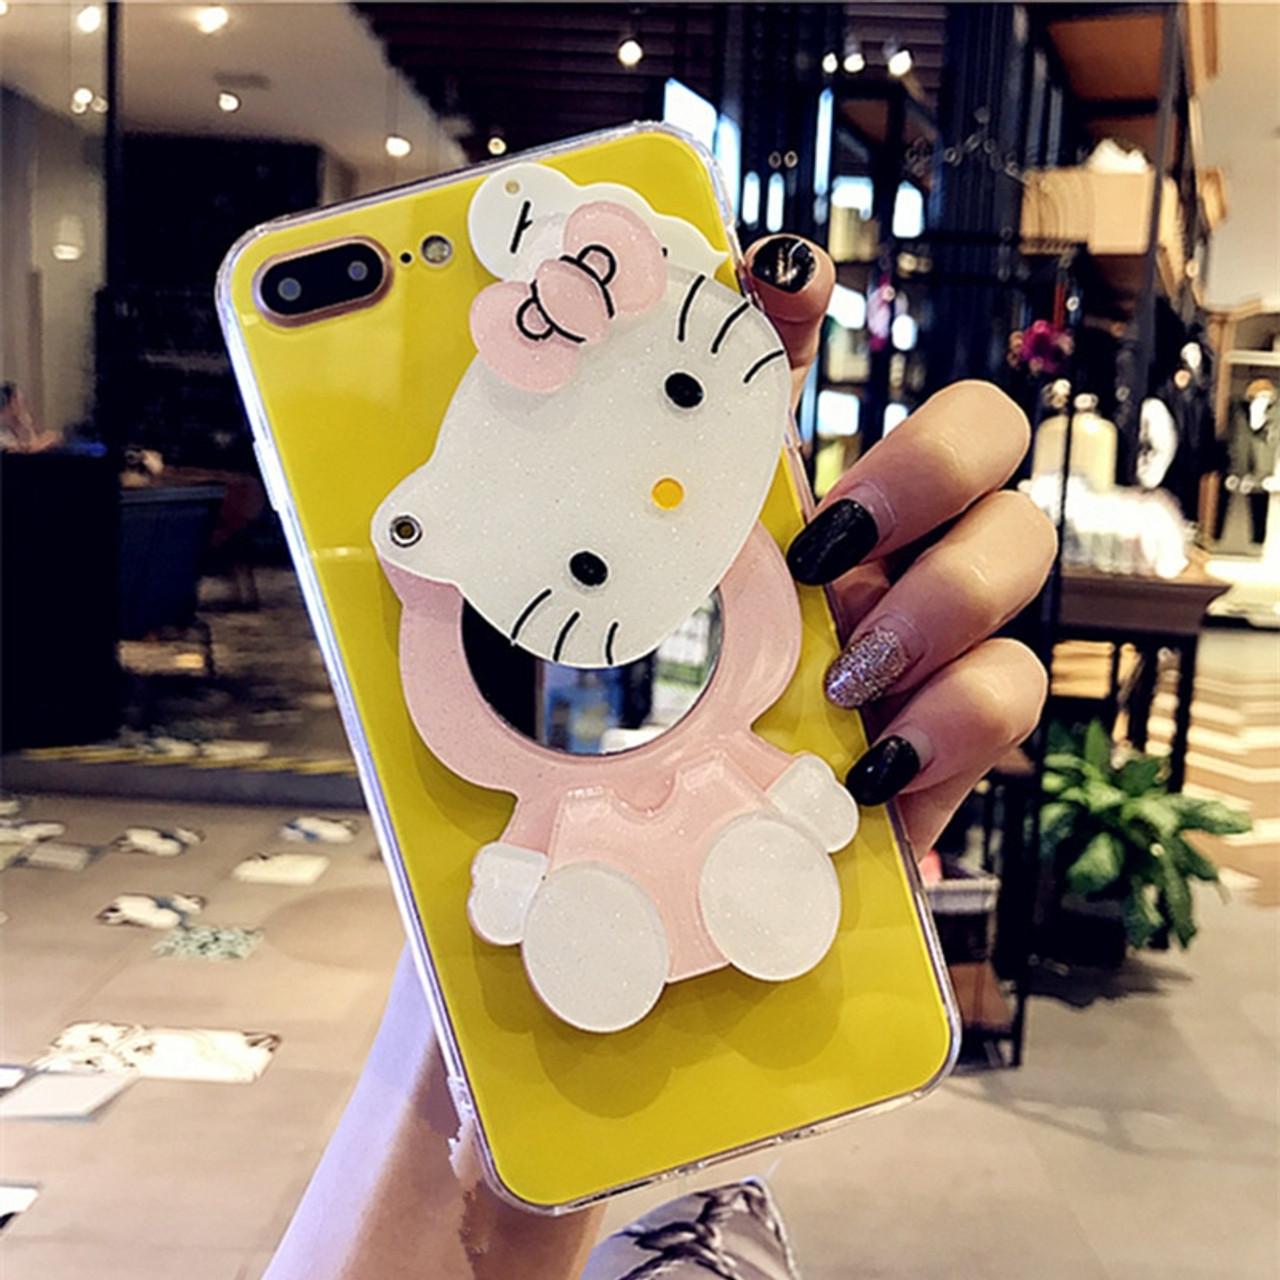 fa51c43b5 ... For iPhone 6 Case iPhone 7 8 Plus Cute Cartoon Hello Kitty Mirror Phone  Case for ...